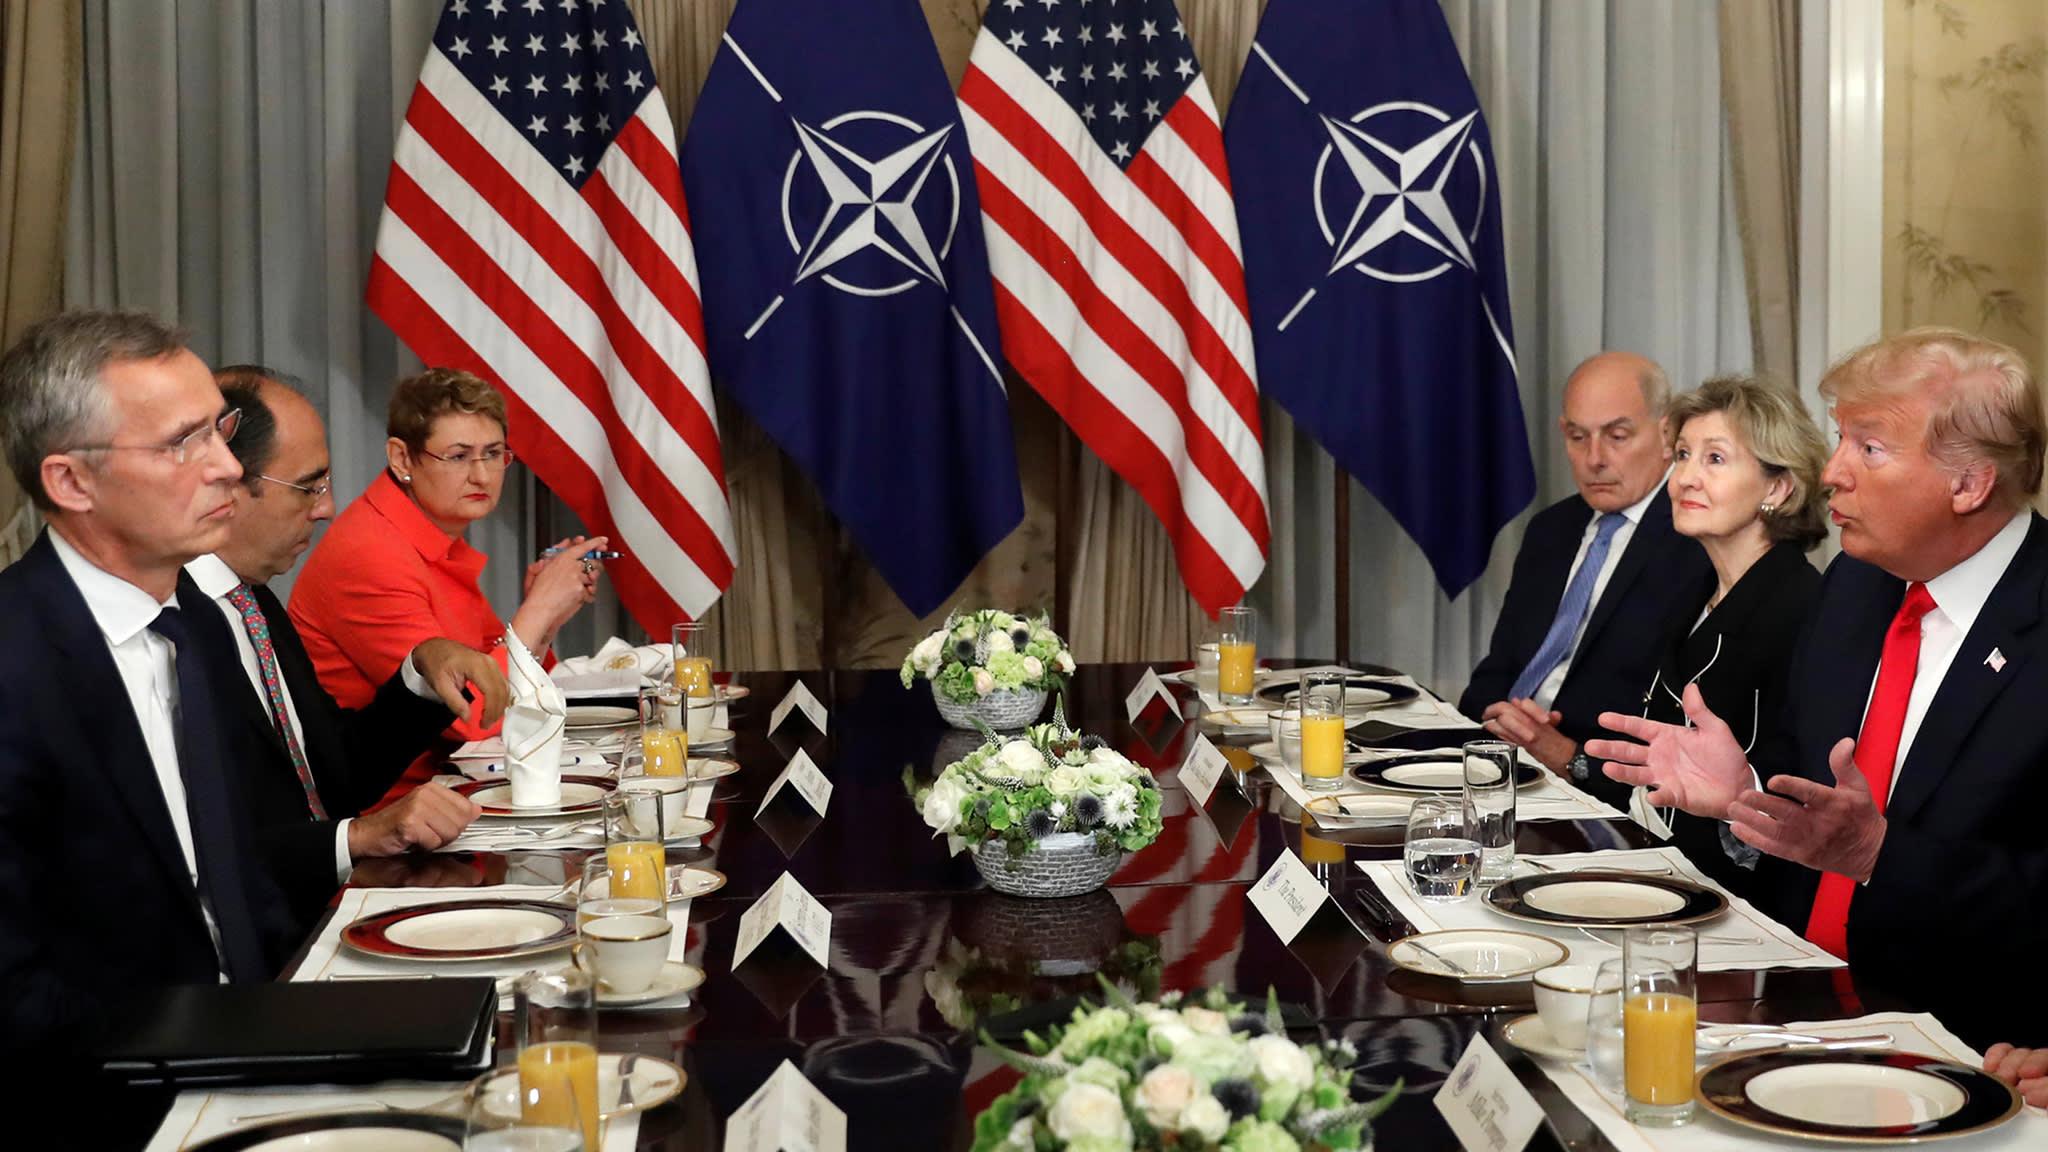 Nato members keep wary eye on Trump's mood